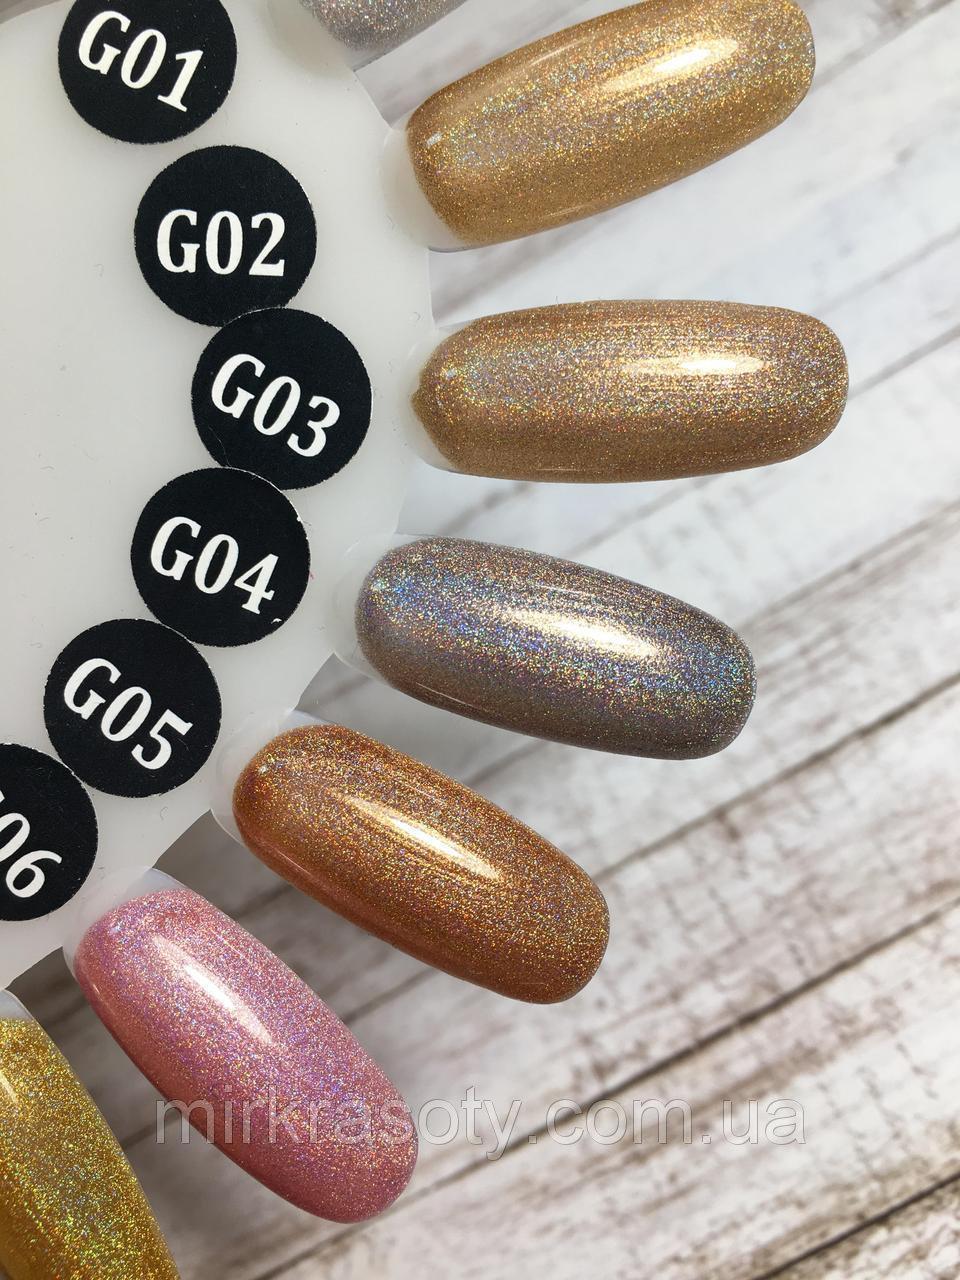 Гель-лак TK Vip-product G-05 (Golografik), 8 мл